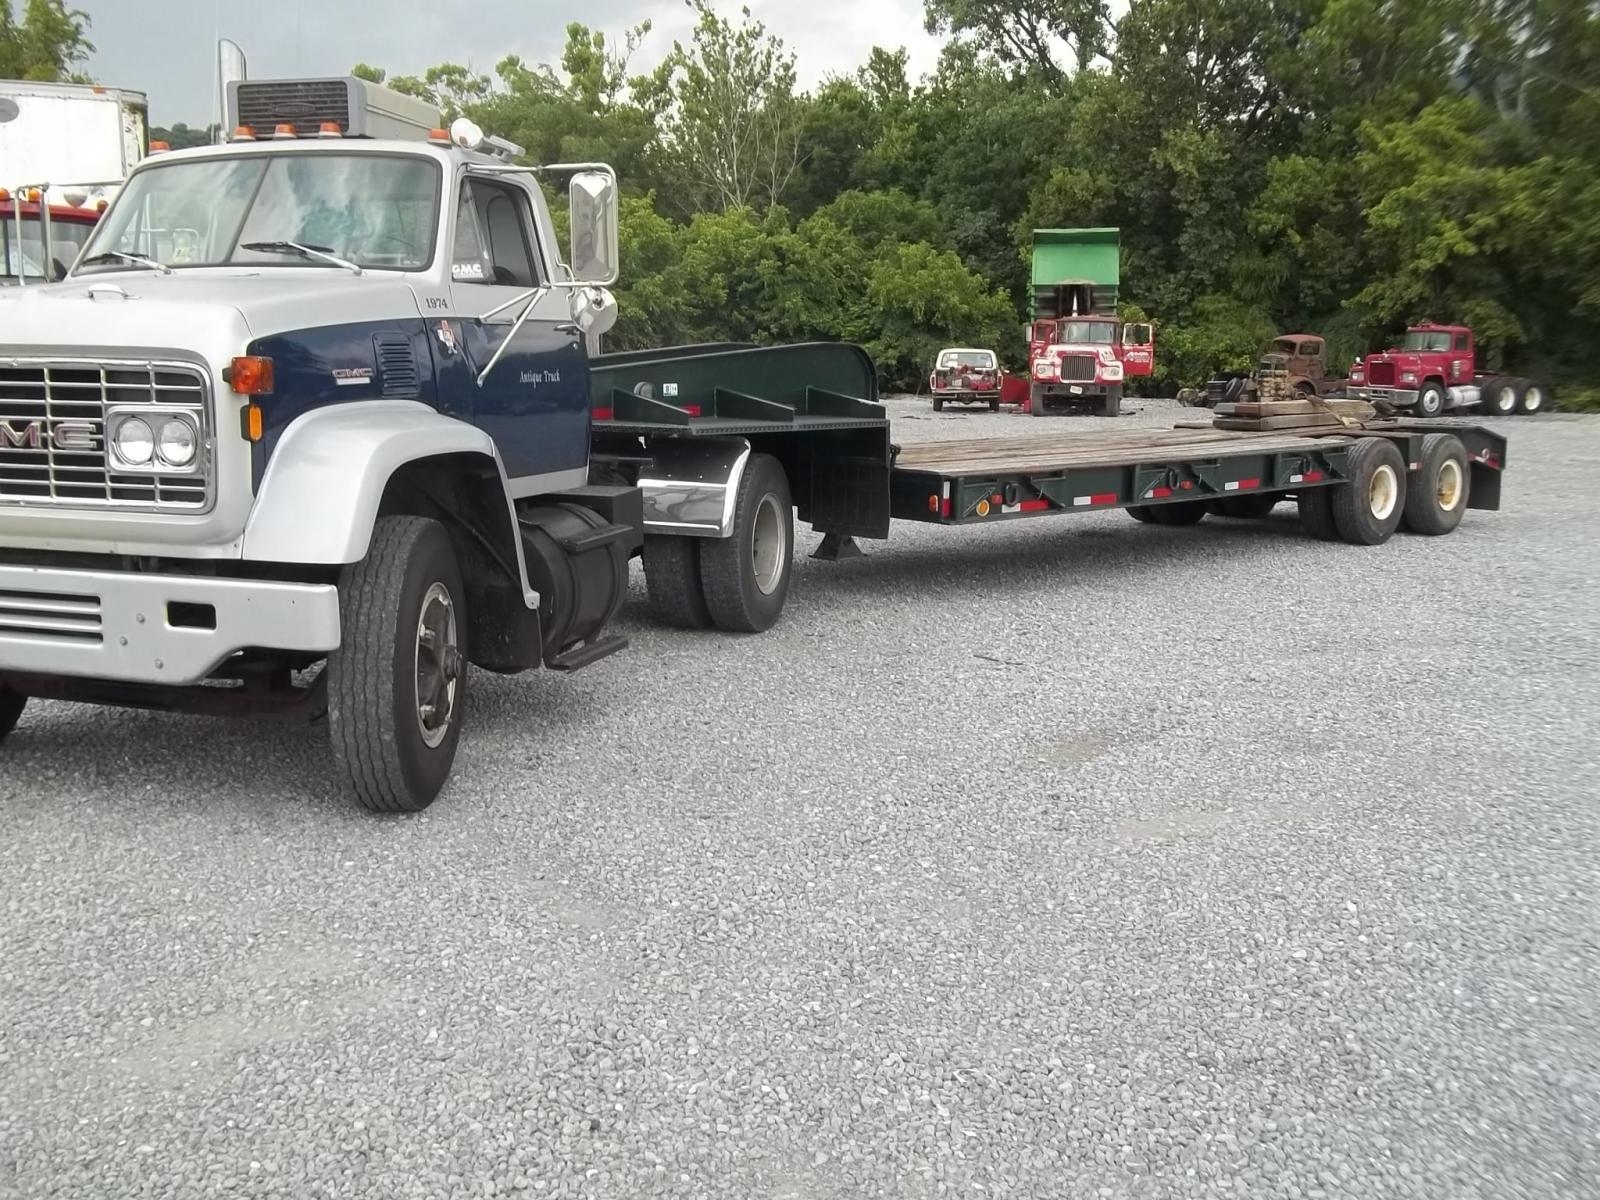 1974 Gmc 9500 Amp Lowbed 25ton Trucks For Sale